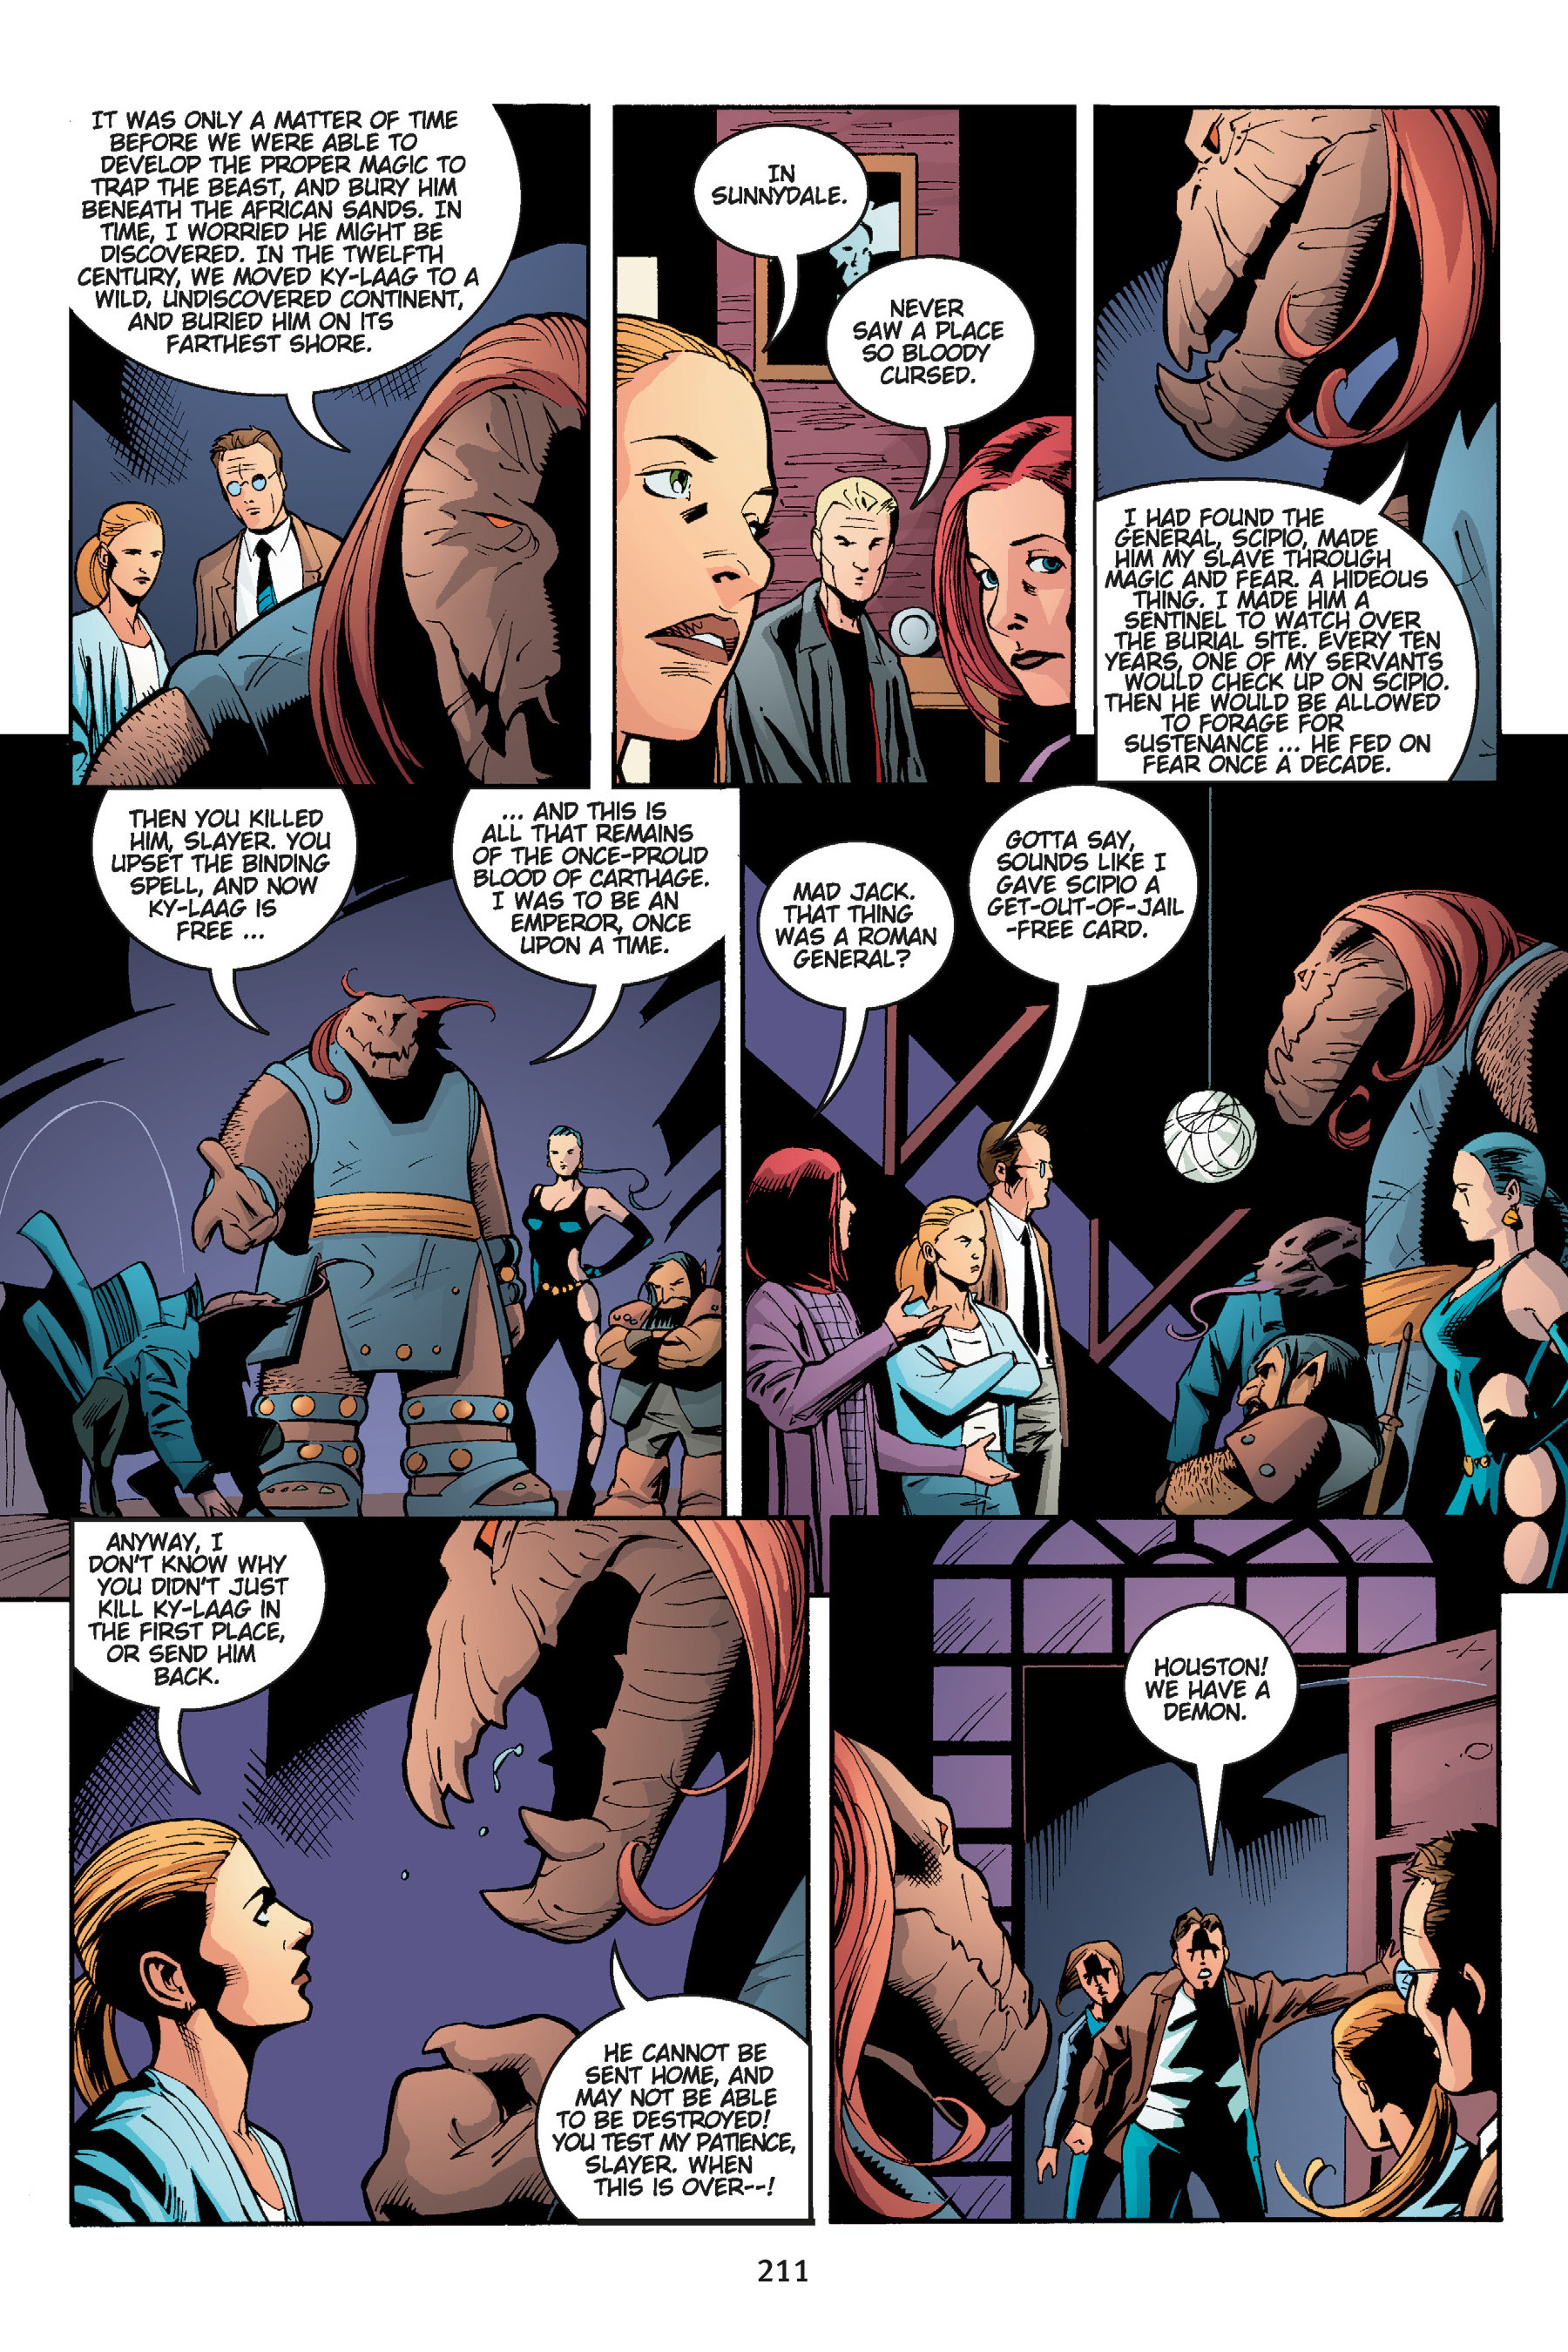 Read online Buffy the Vampire Slayer: Omnibus comic -  Issue # TPB 5 - 211